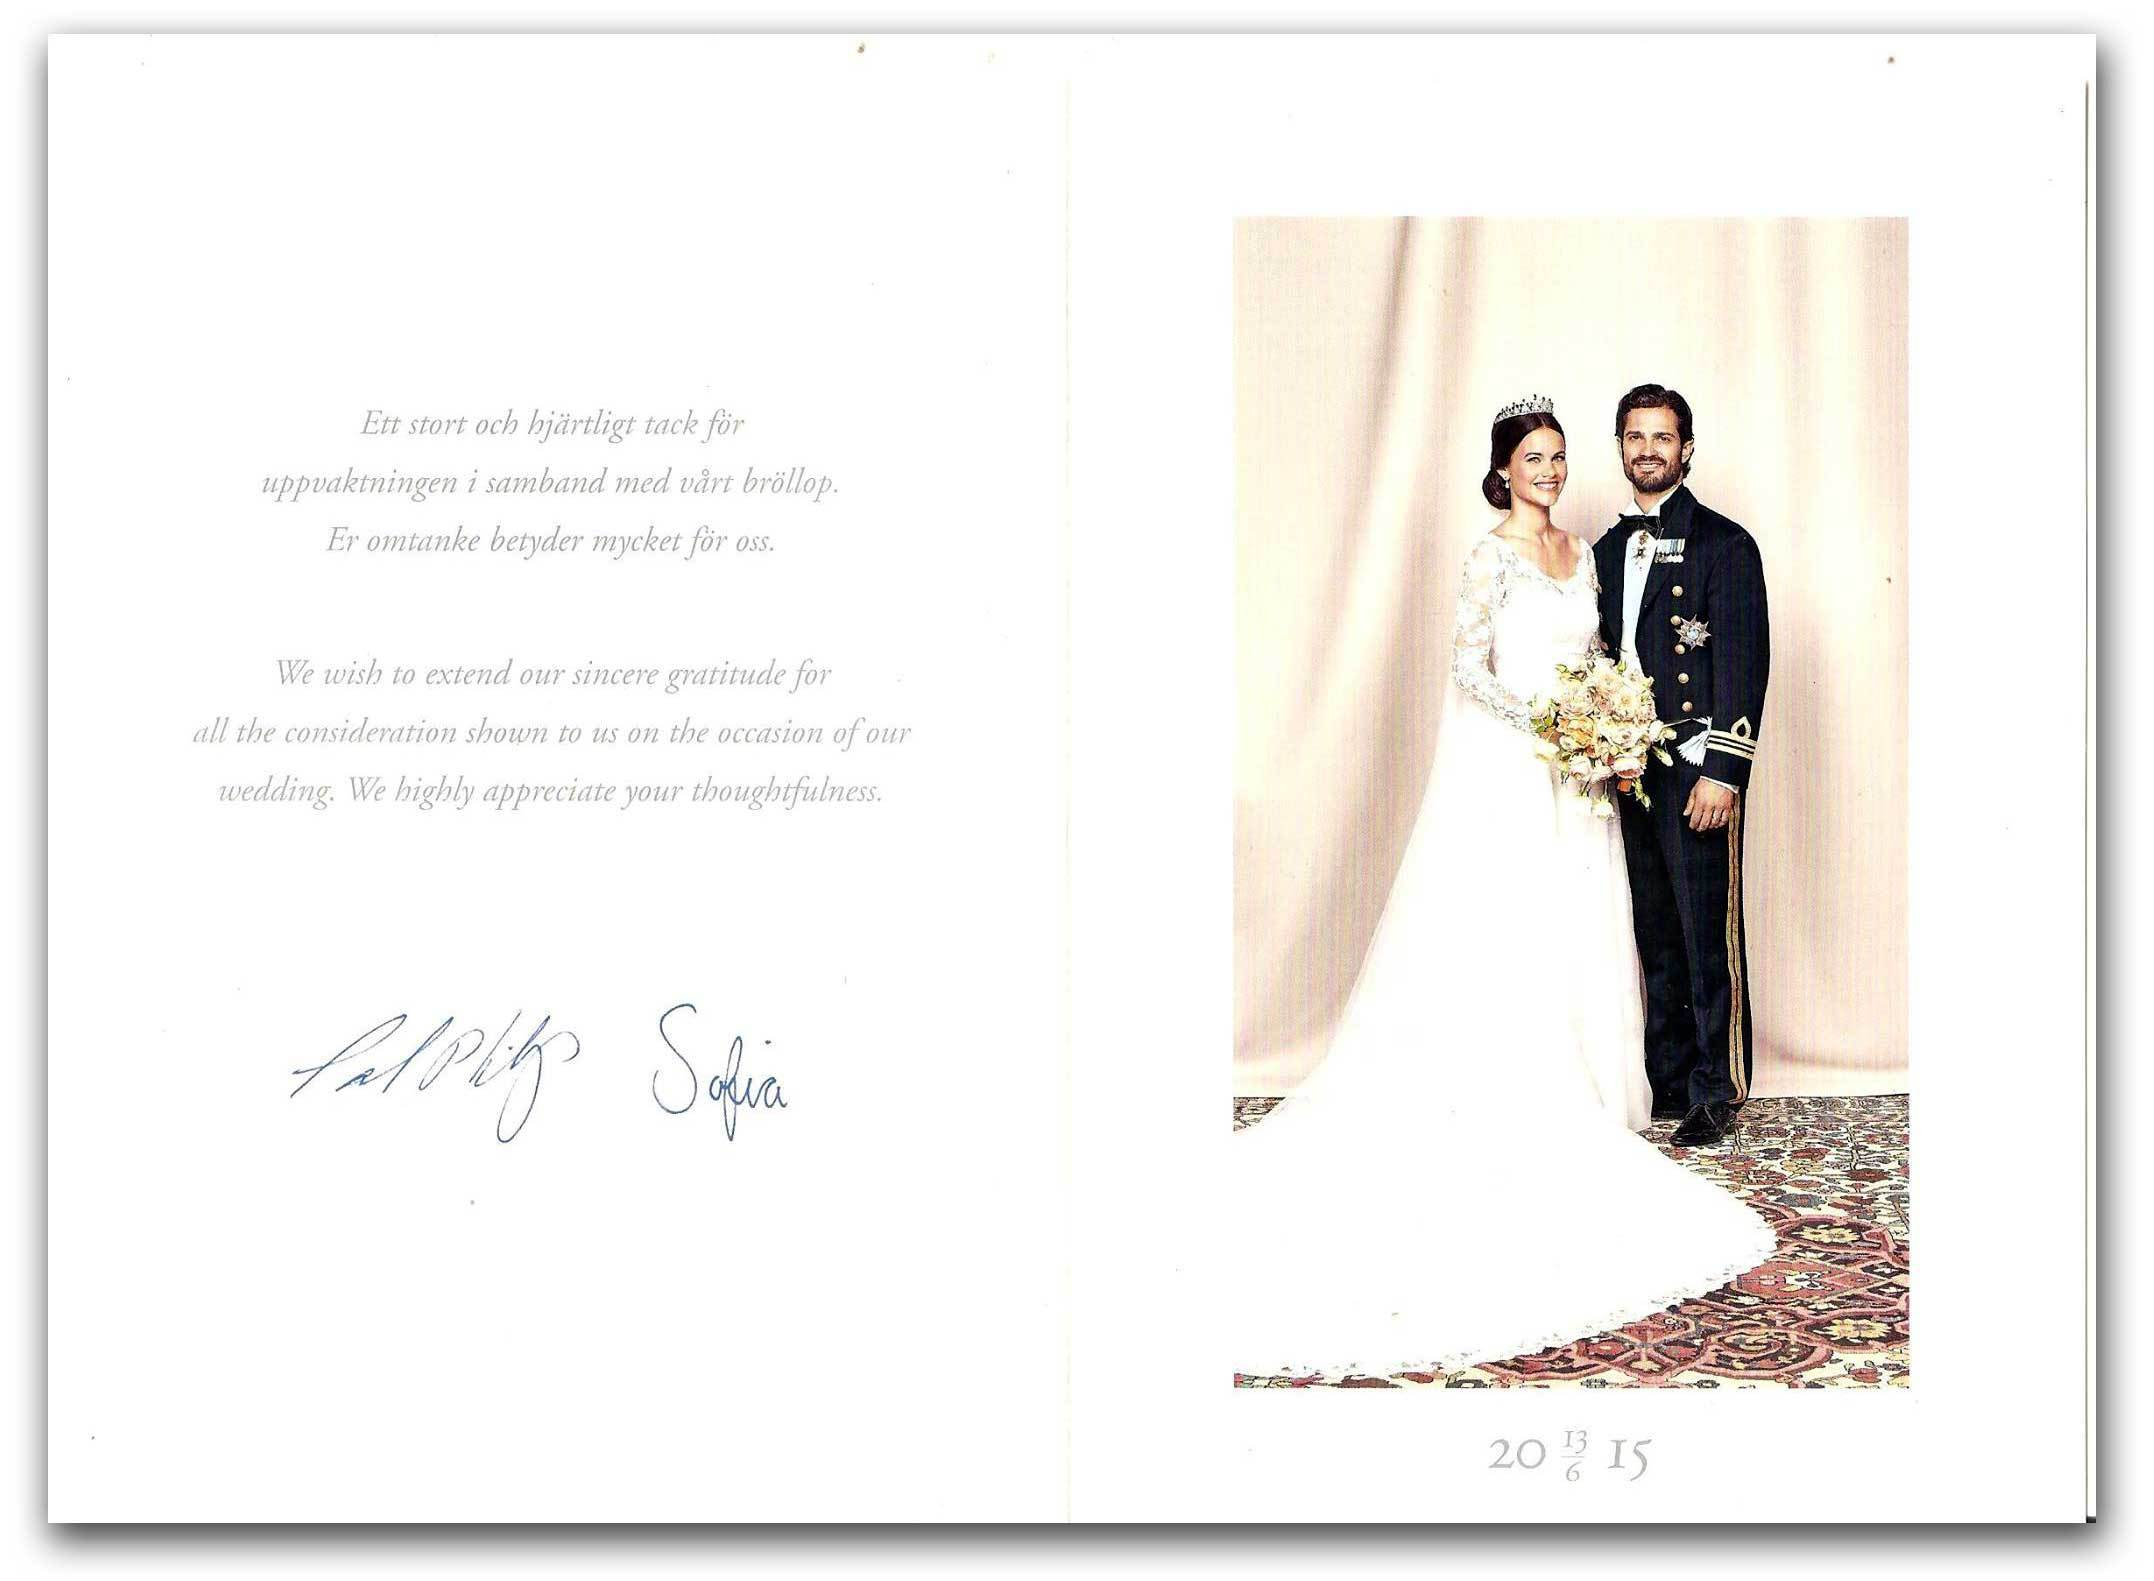 grattis bröllop text Carl Philips bröllop | Hovbloggen grattis bröllop text